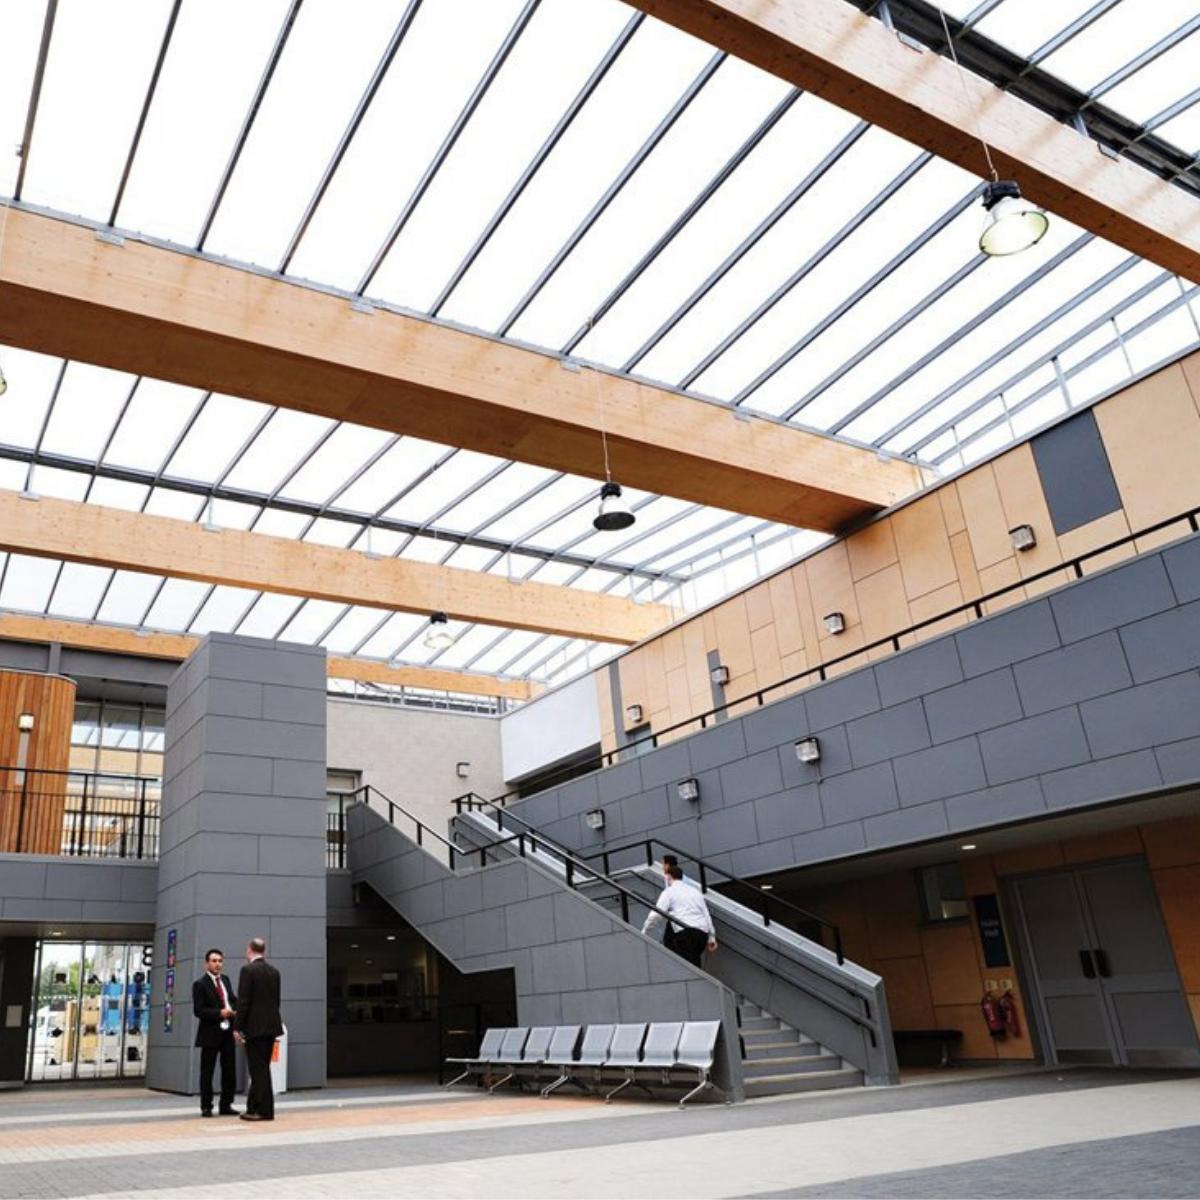 Atrium Canopy